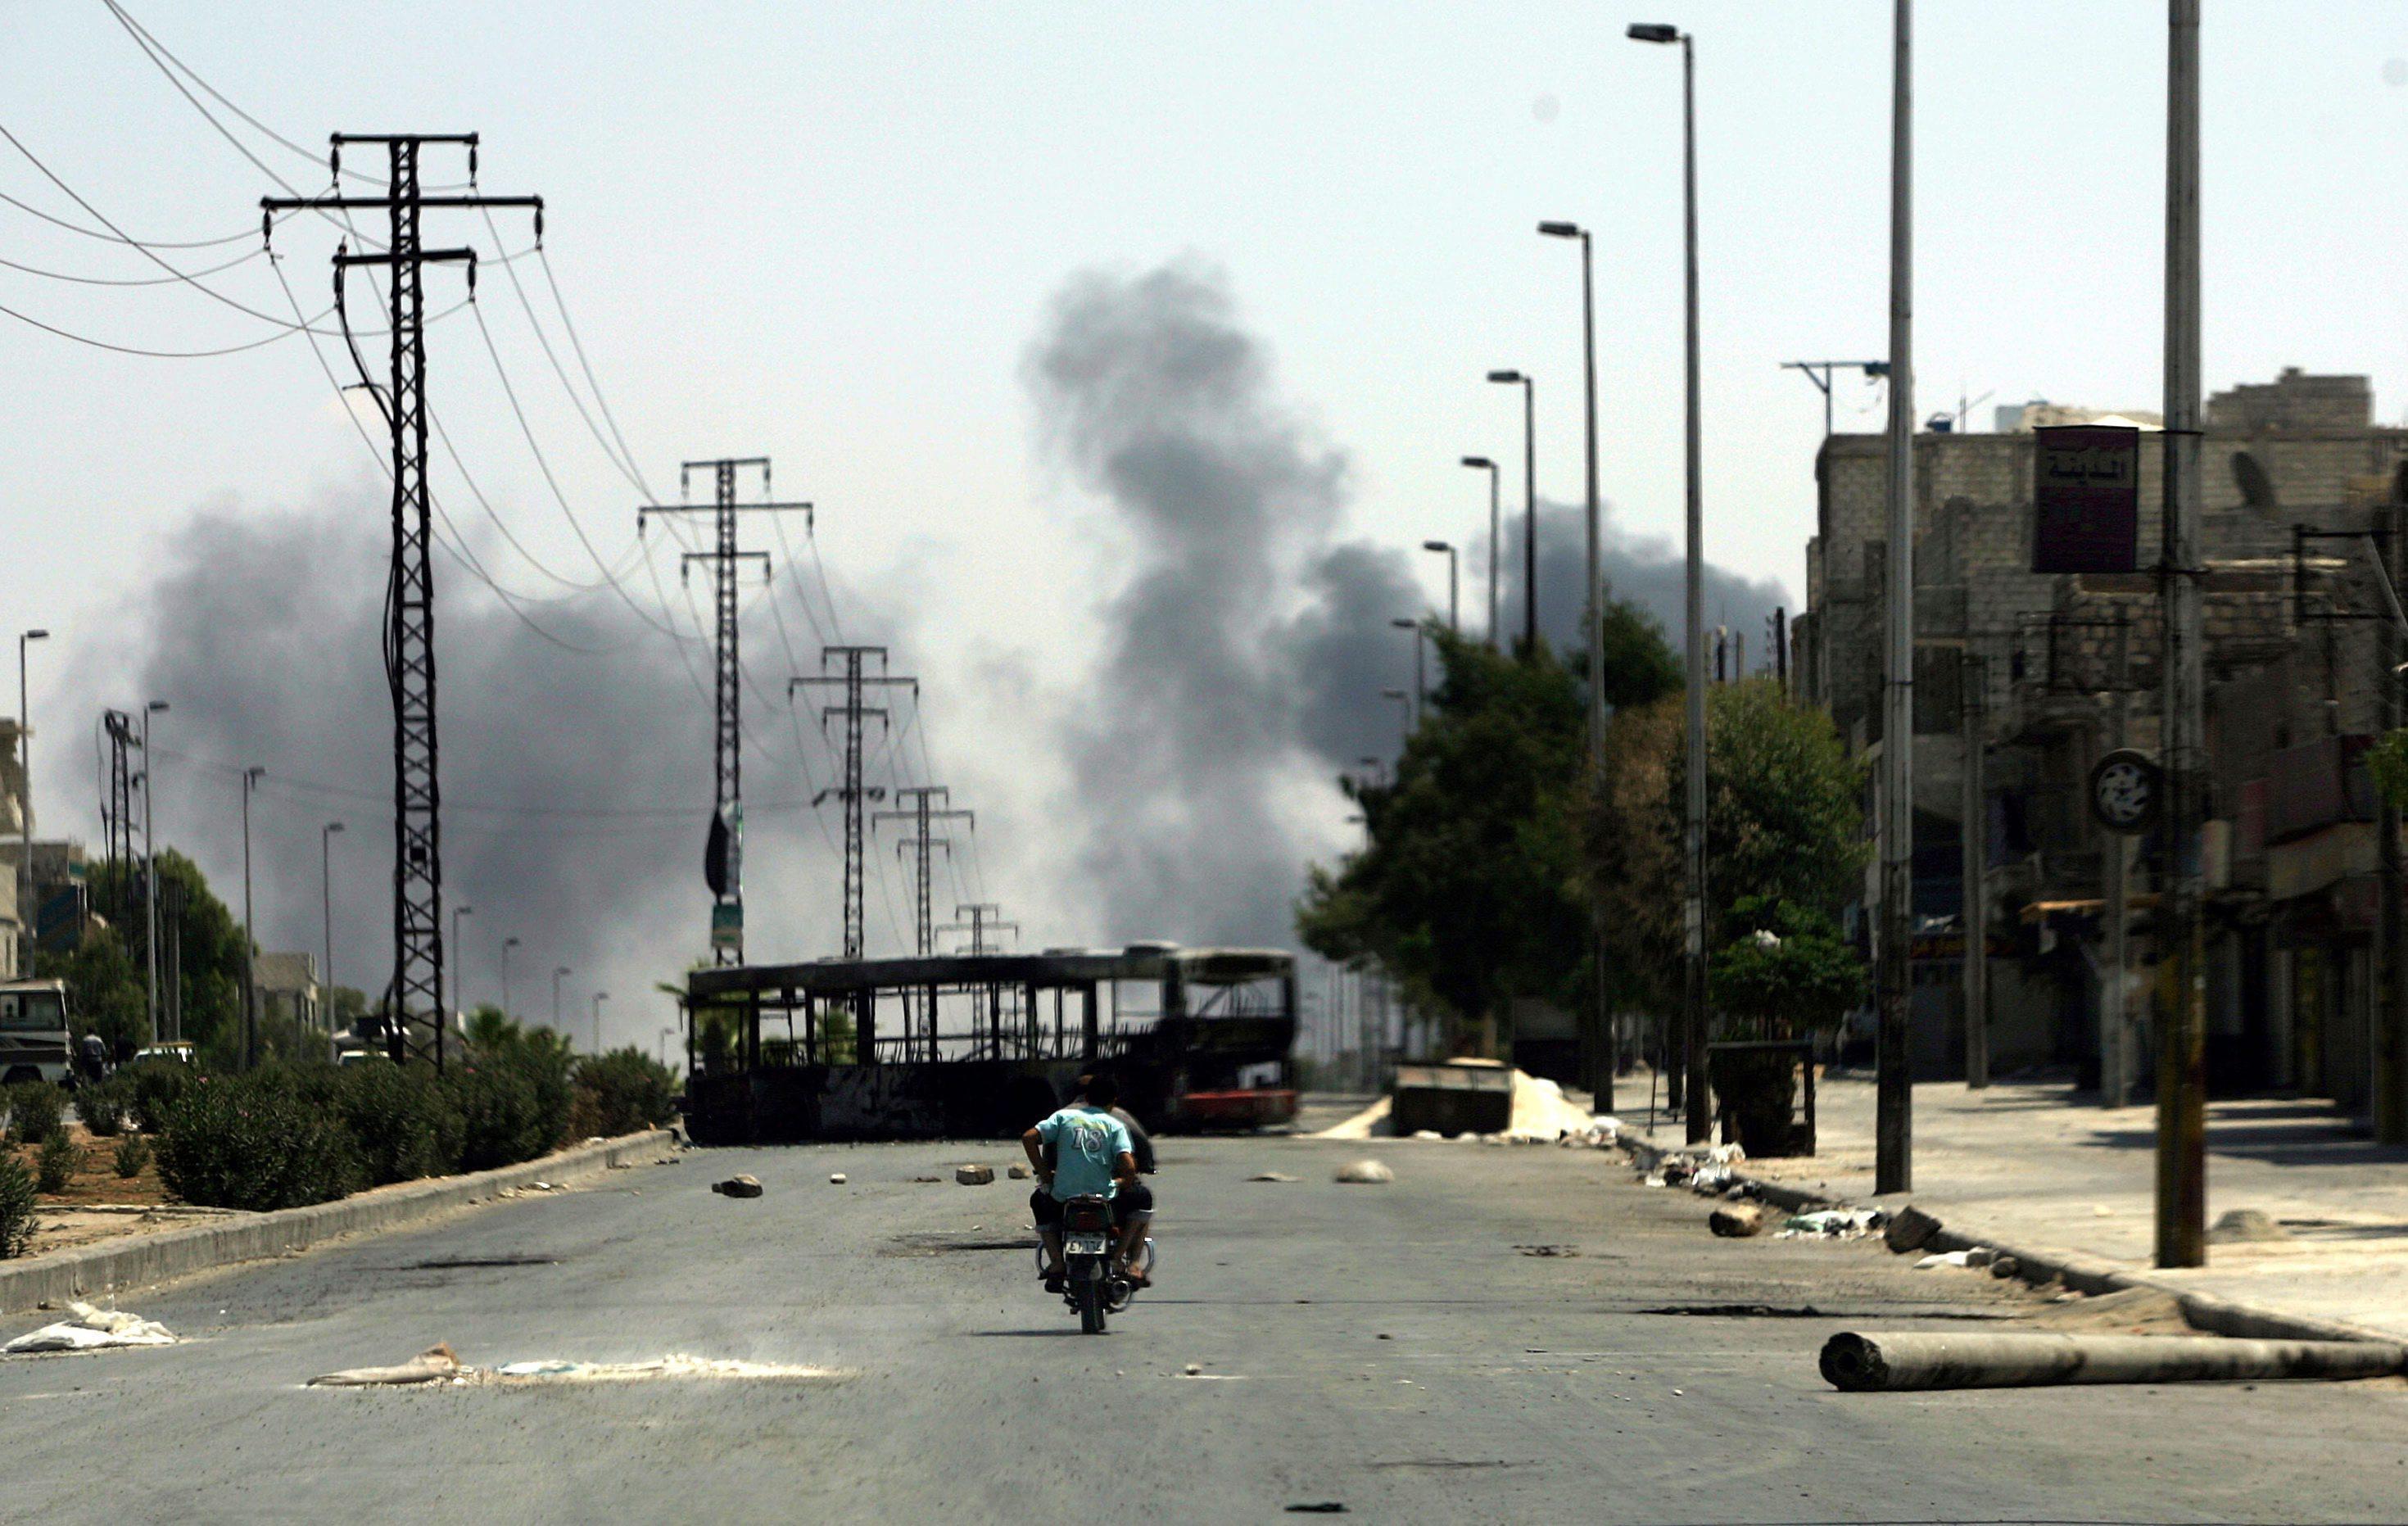 Syrian rebels patrol streets near Aleppo